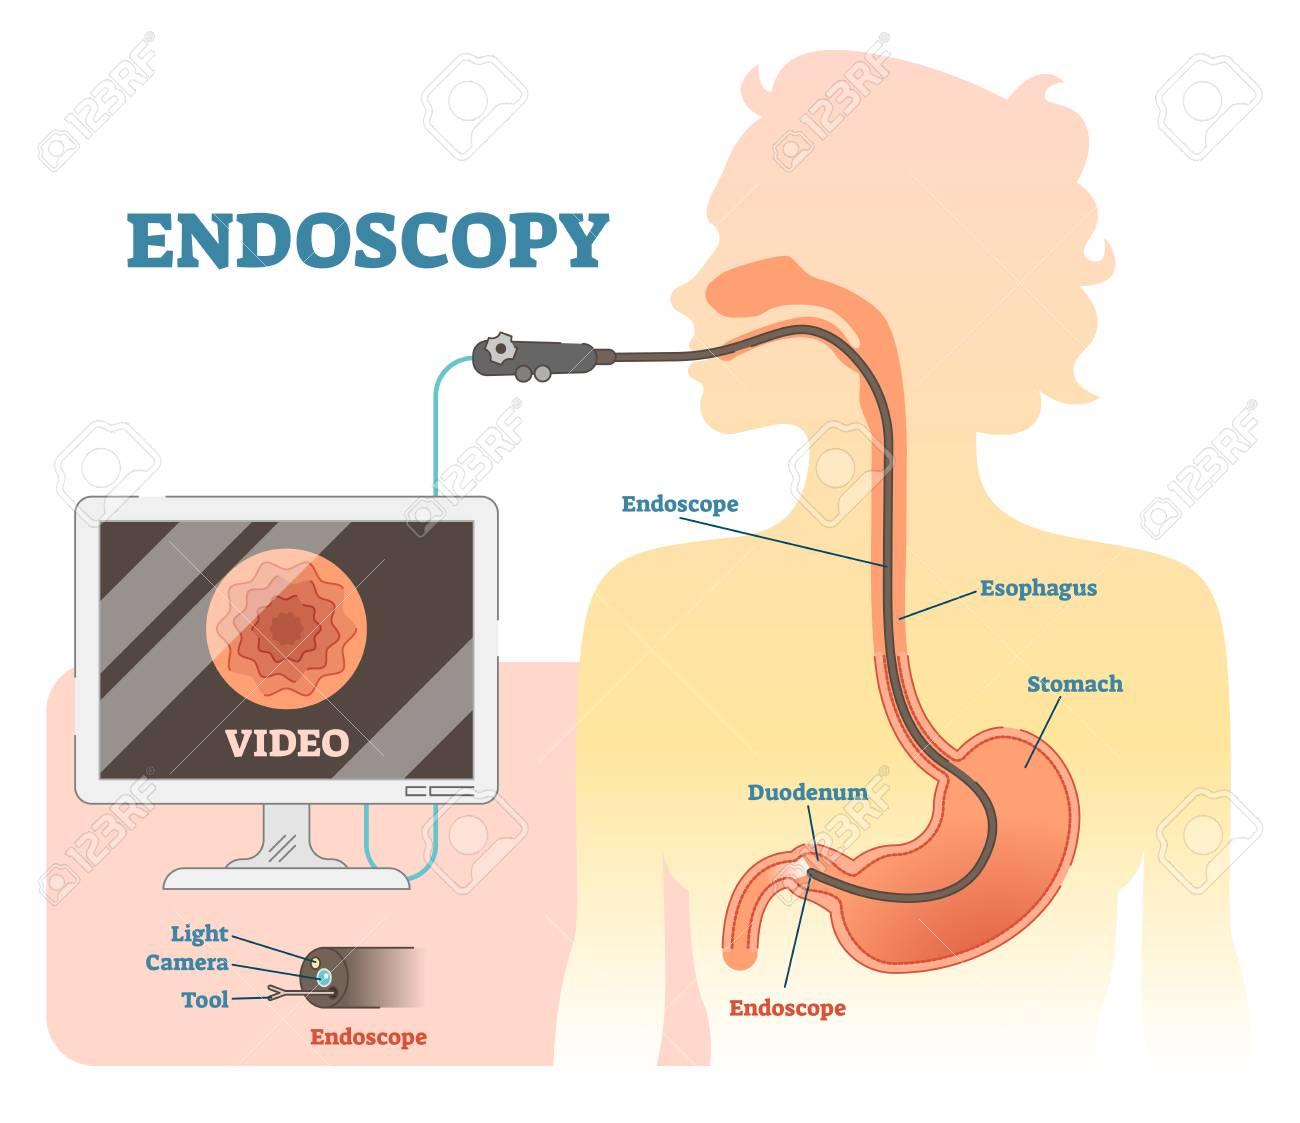 endoscopy anatomical vector illustration diagram, medical scheme